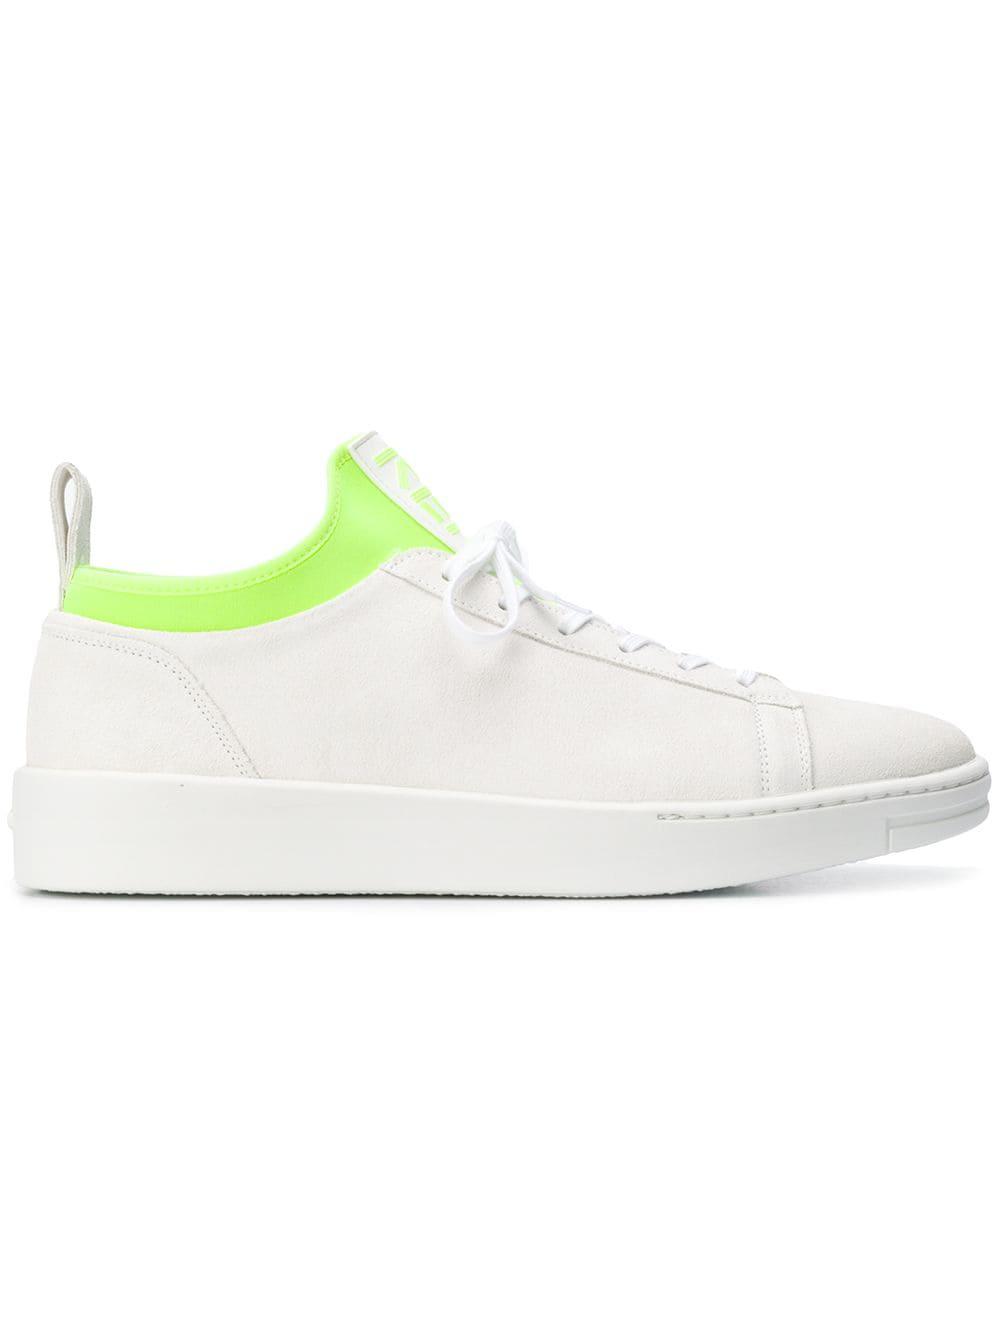 76166e349 Kenzo 'K-City' Sneakers - Weiß In White | ModeSens